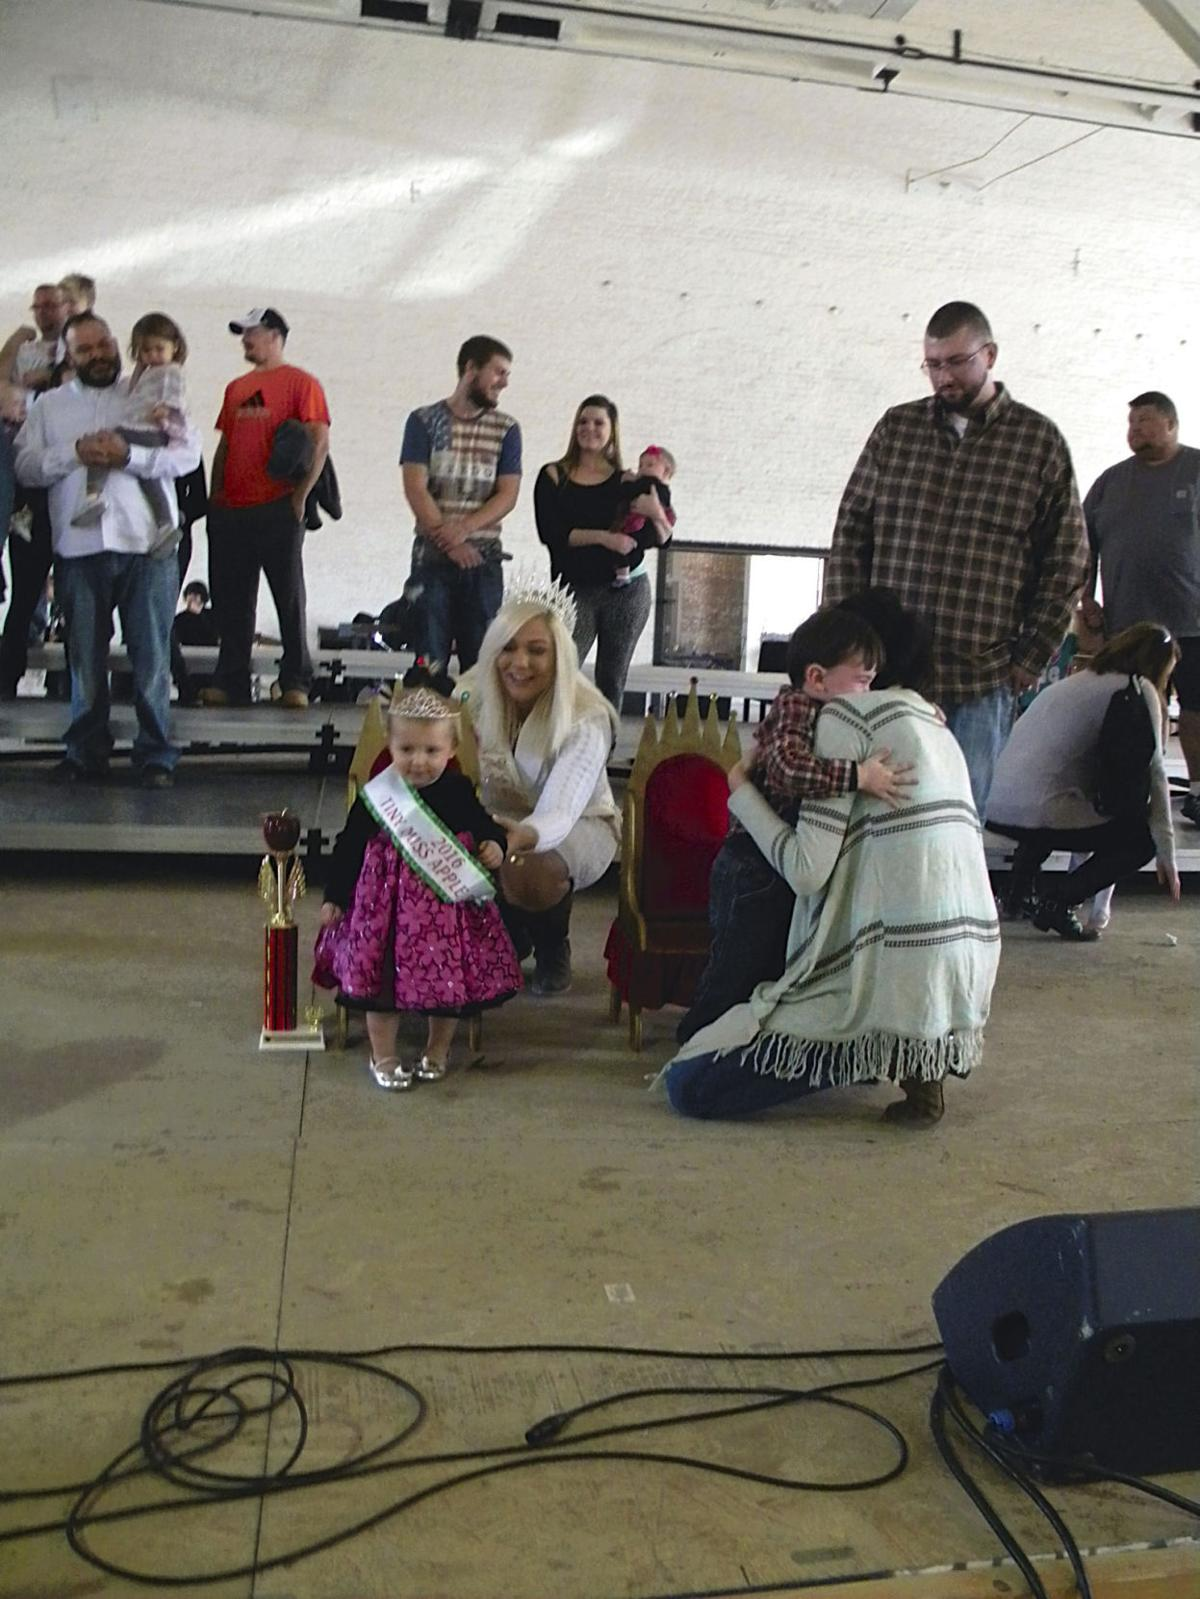 Martinsburg festival wraps up four days of fun